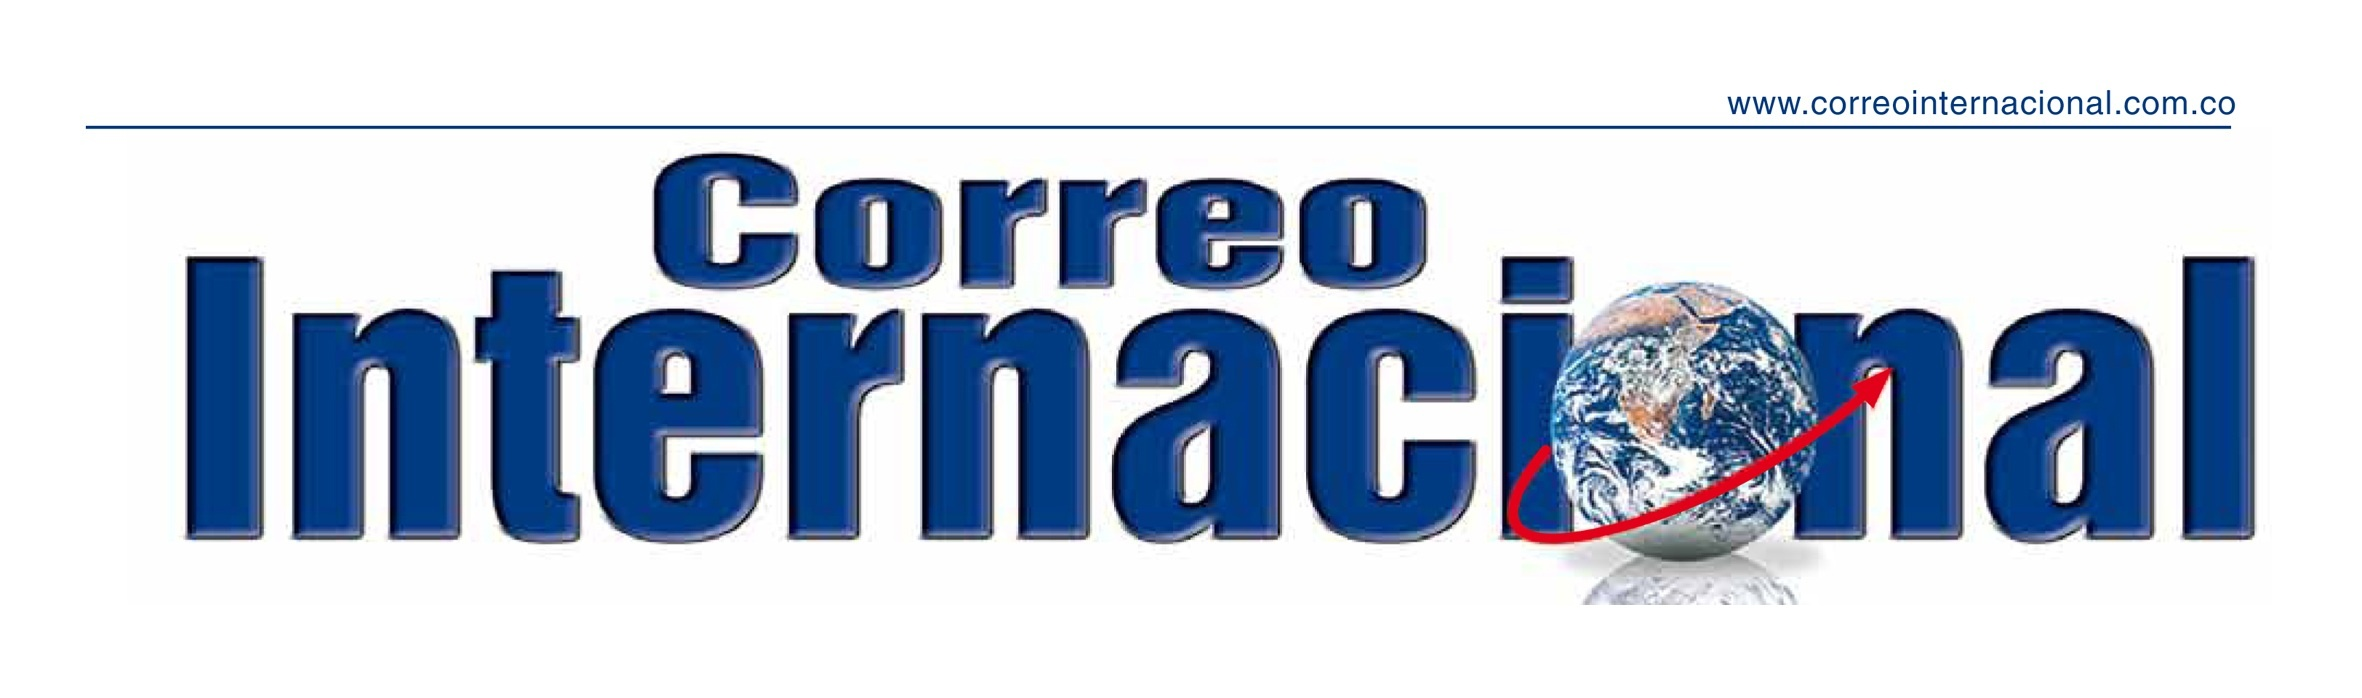 https://0201.nccdn.net/1_2/000/000/150/b5a/Logo-Correo-Internacional-2362x698.jpg